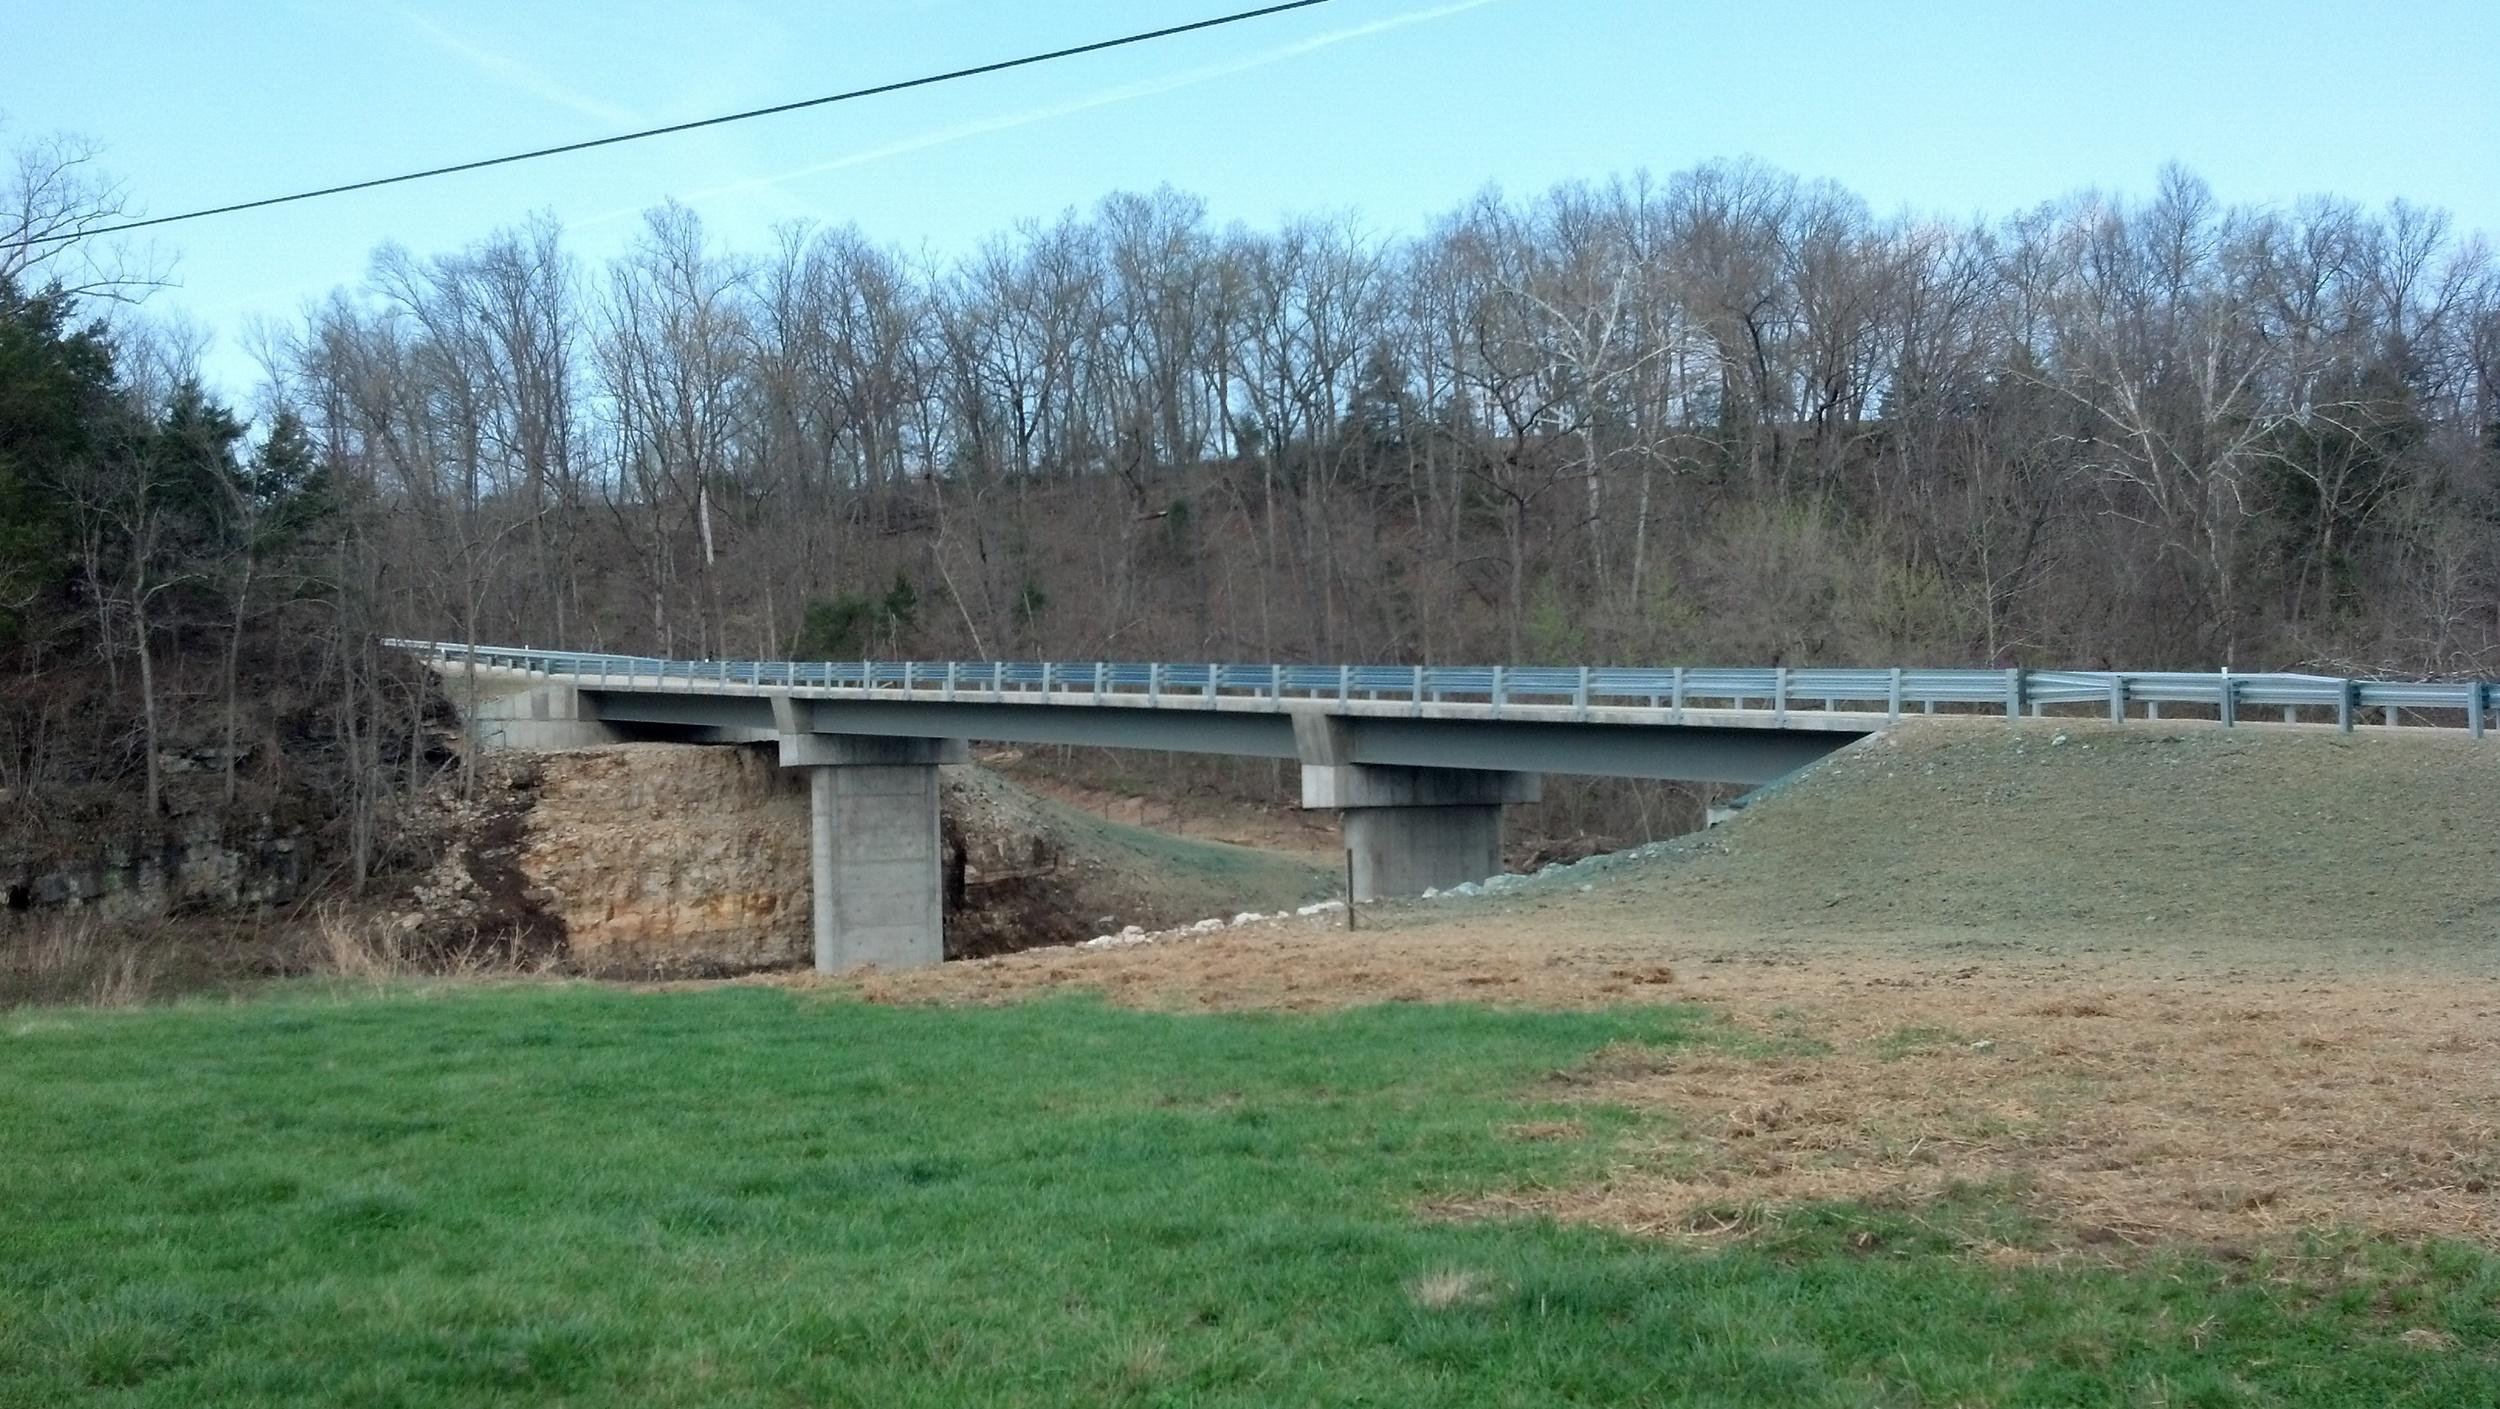 St. Anthony, MO Buechter Rd Bridge